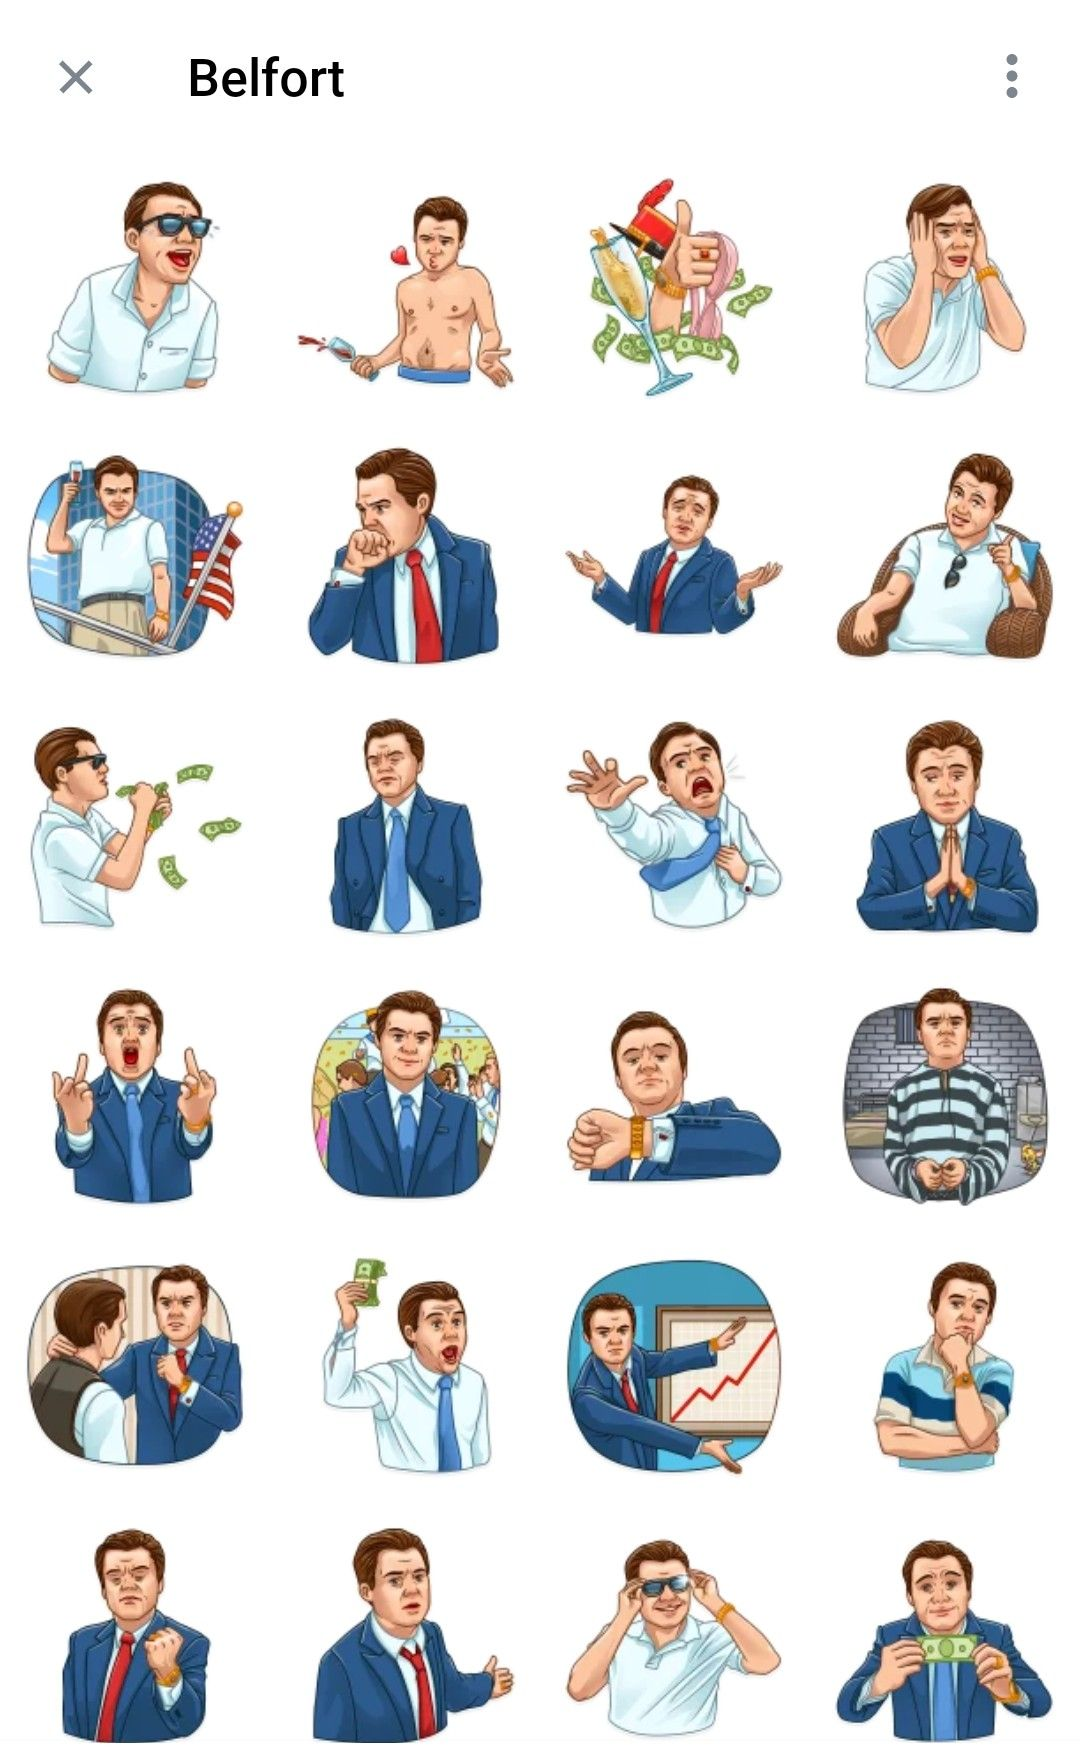 Belfort Telegram sticker packs   Telegram stickers, Stickers packs ...